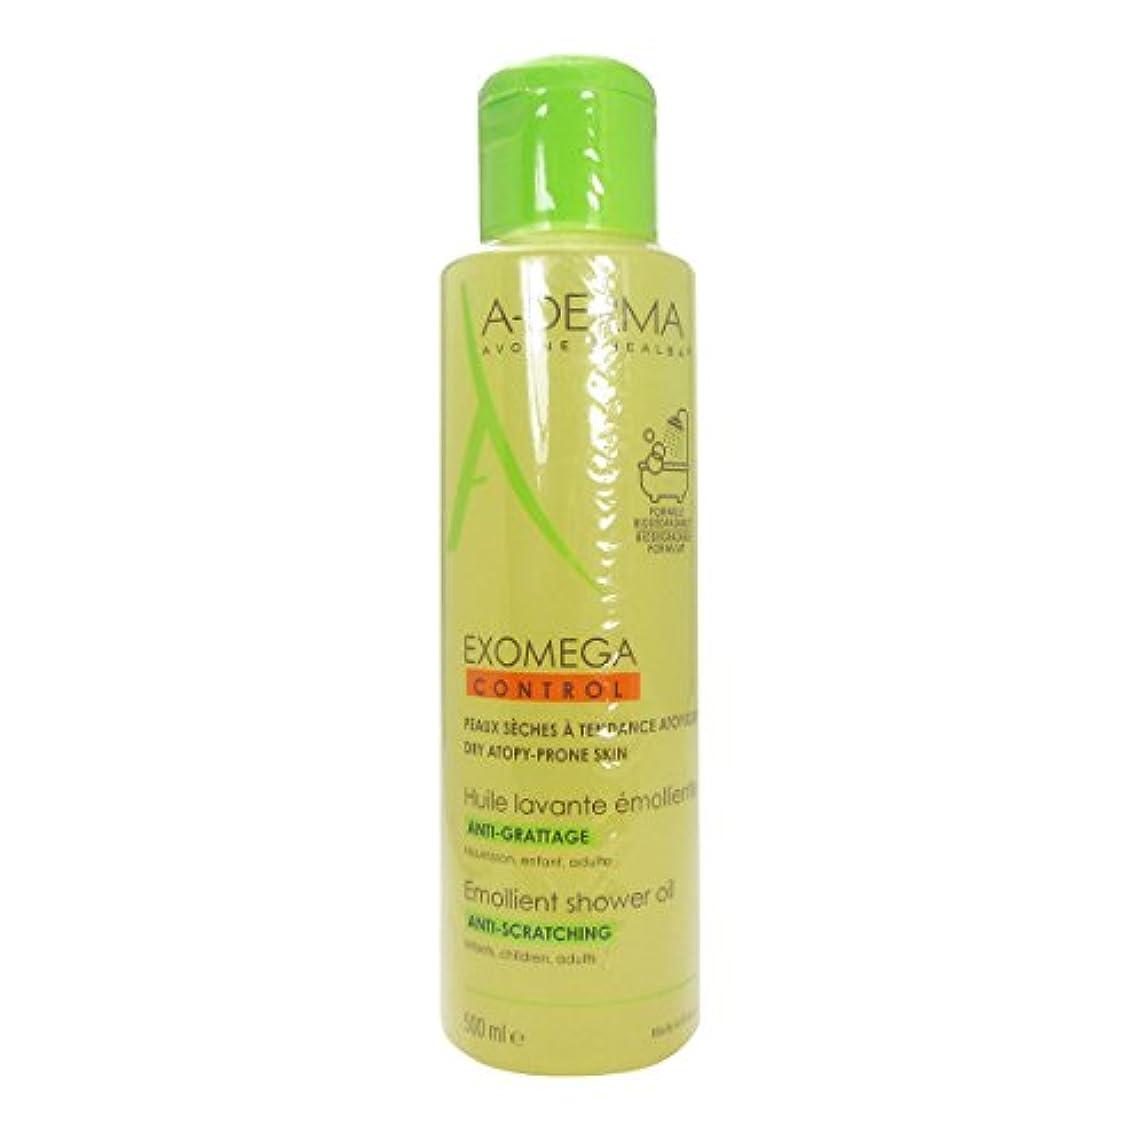 A-derma Exomega Control Shower And Bath Oil 500ml [並行輸入品]